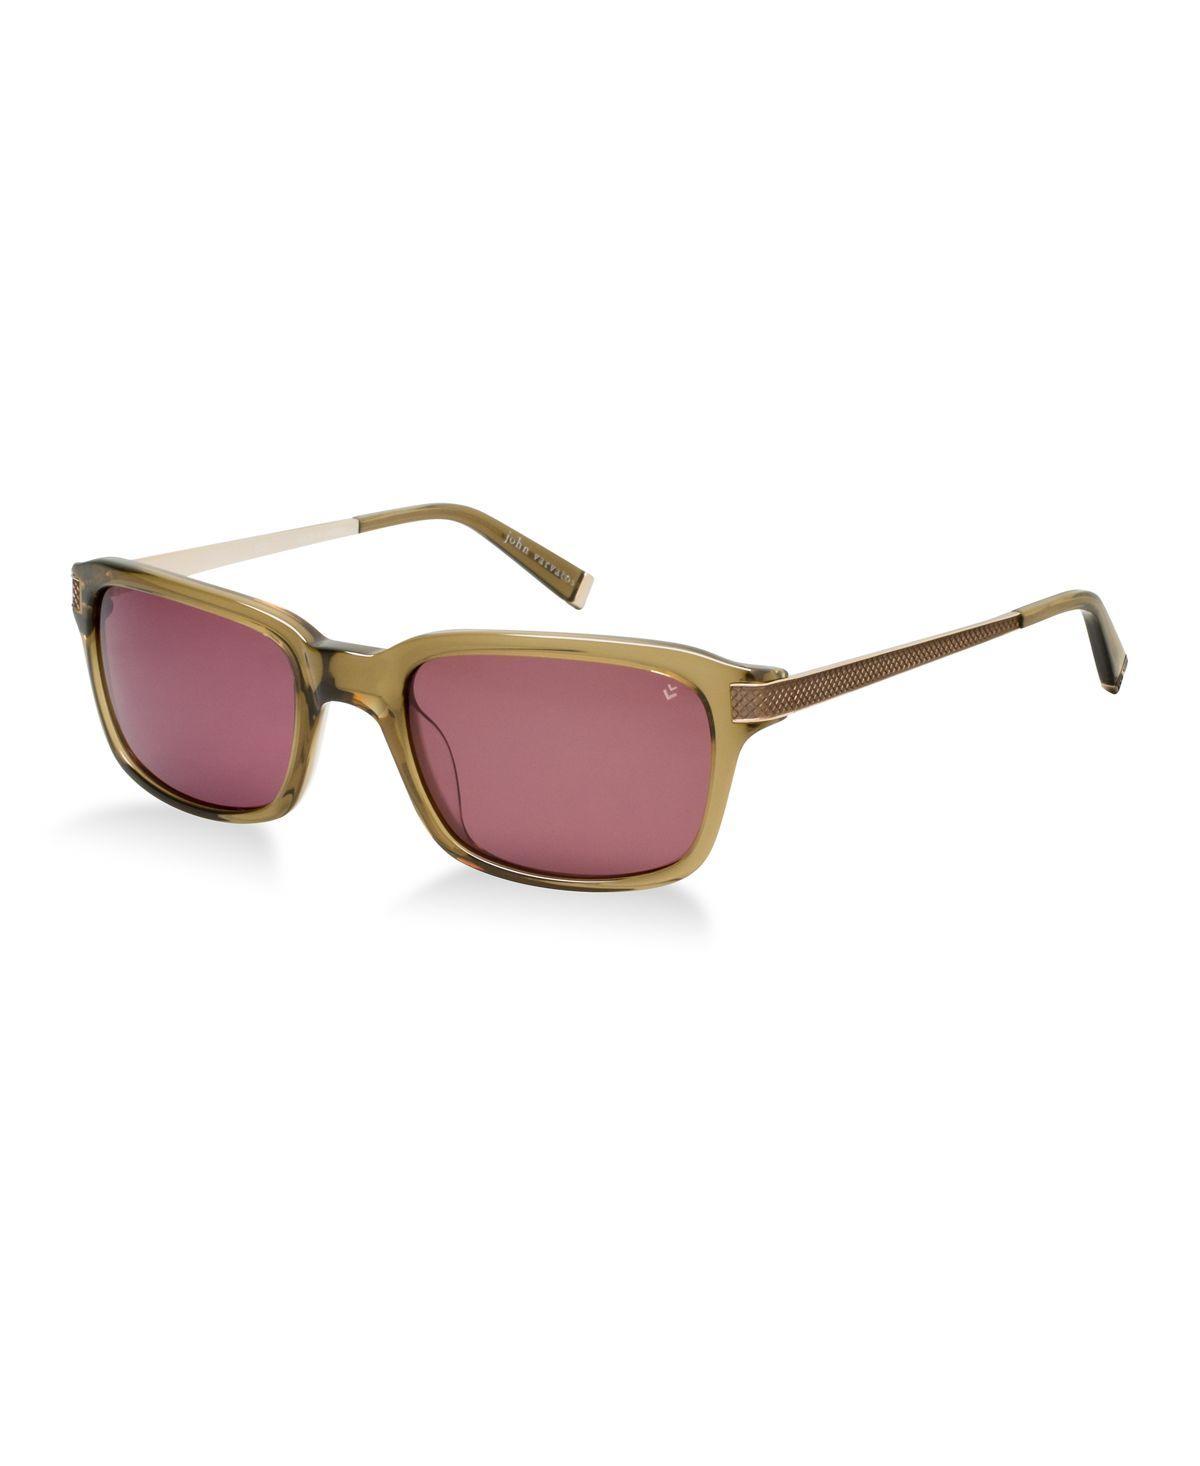 John Varvatos Sunglasses, JV781